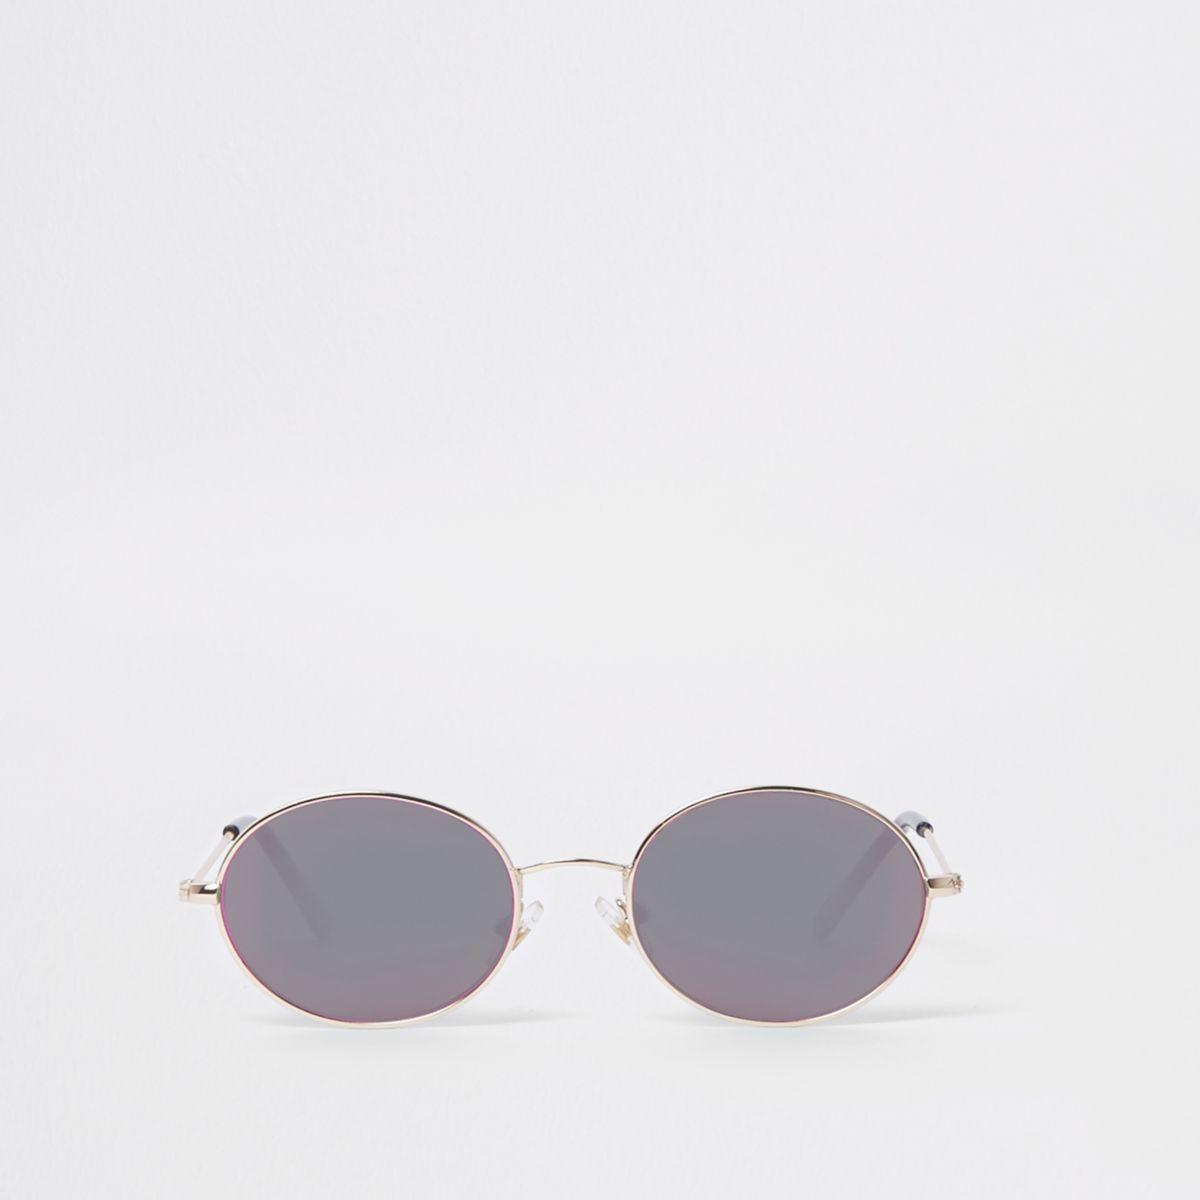 Boys silver tone oval grey lens sunglasses